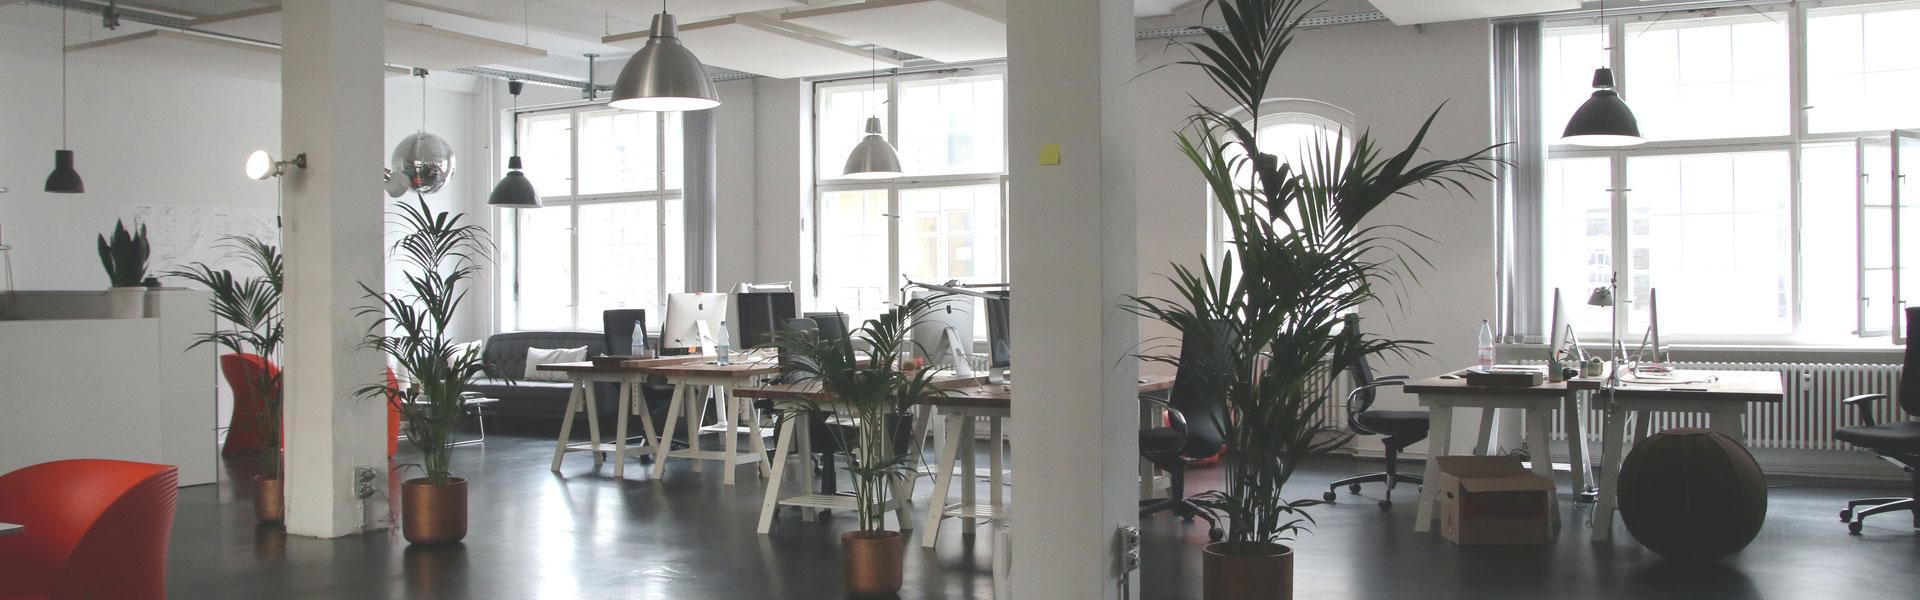 Empty office environment